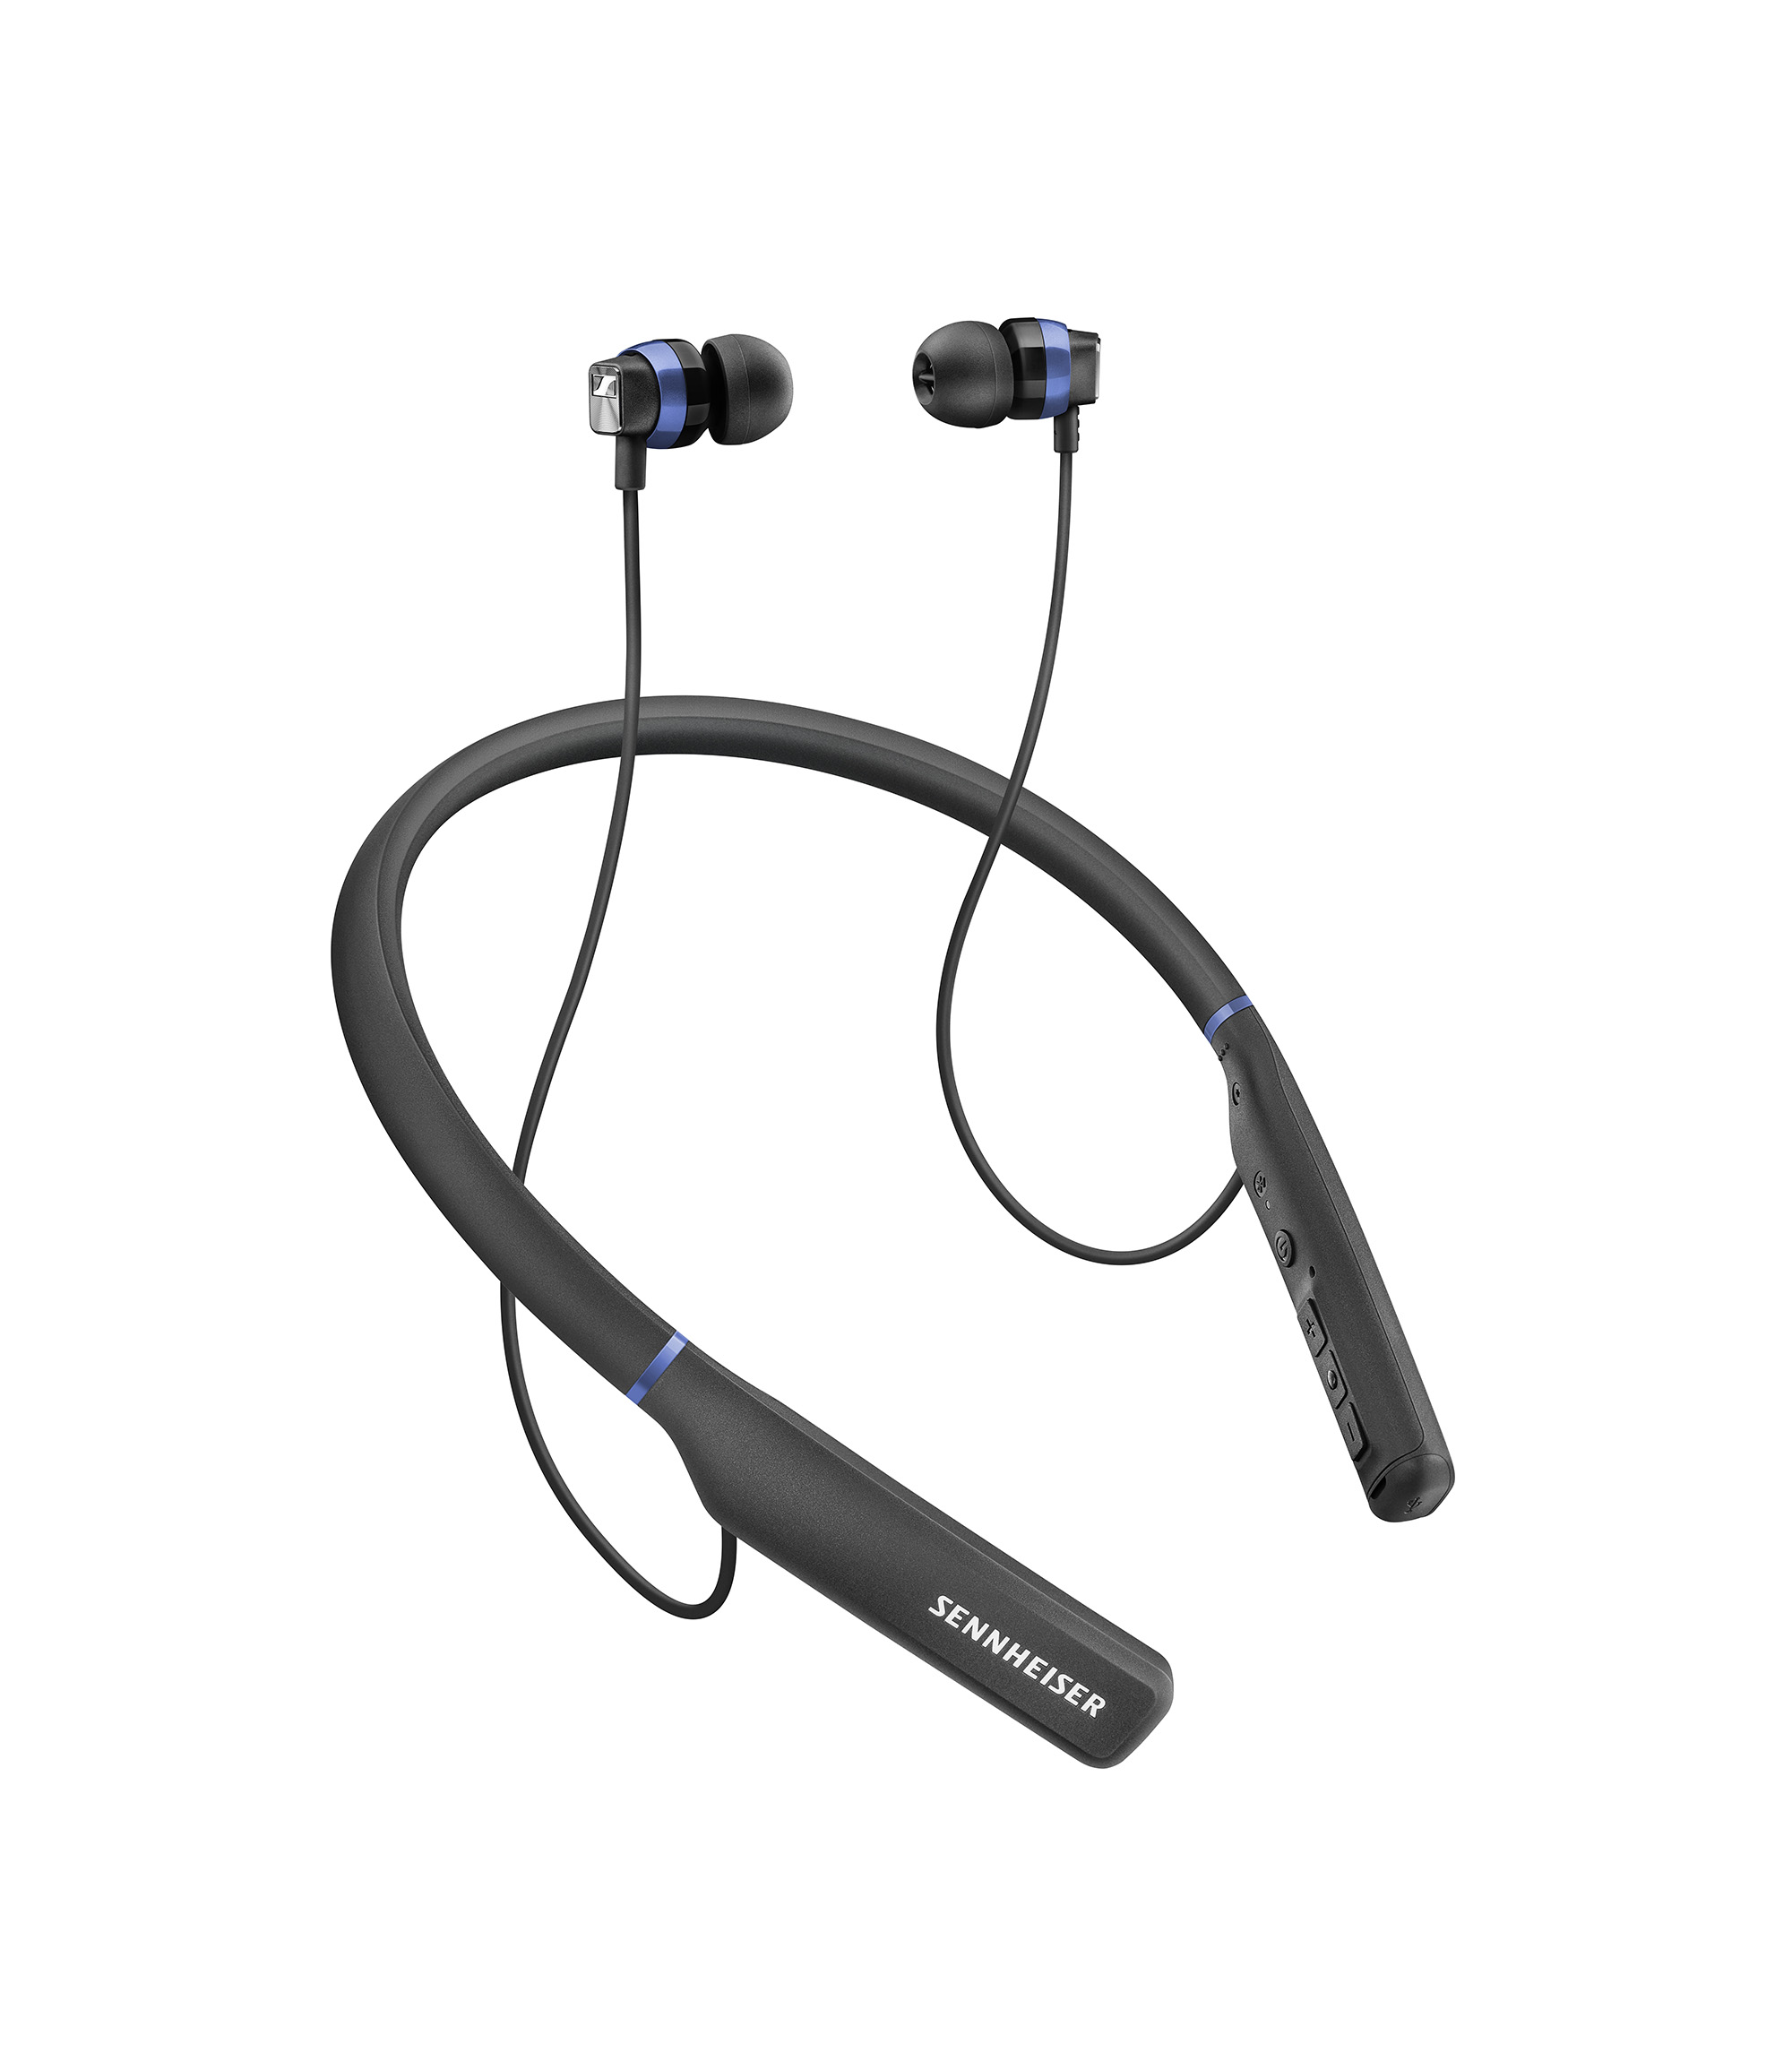 Sennheiser CX 7.00BT IFA 2017: Sennheiser Launches 3 New Wireless Headphones